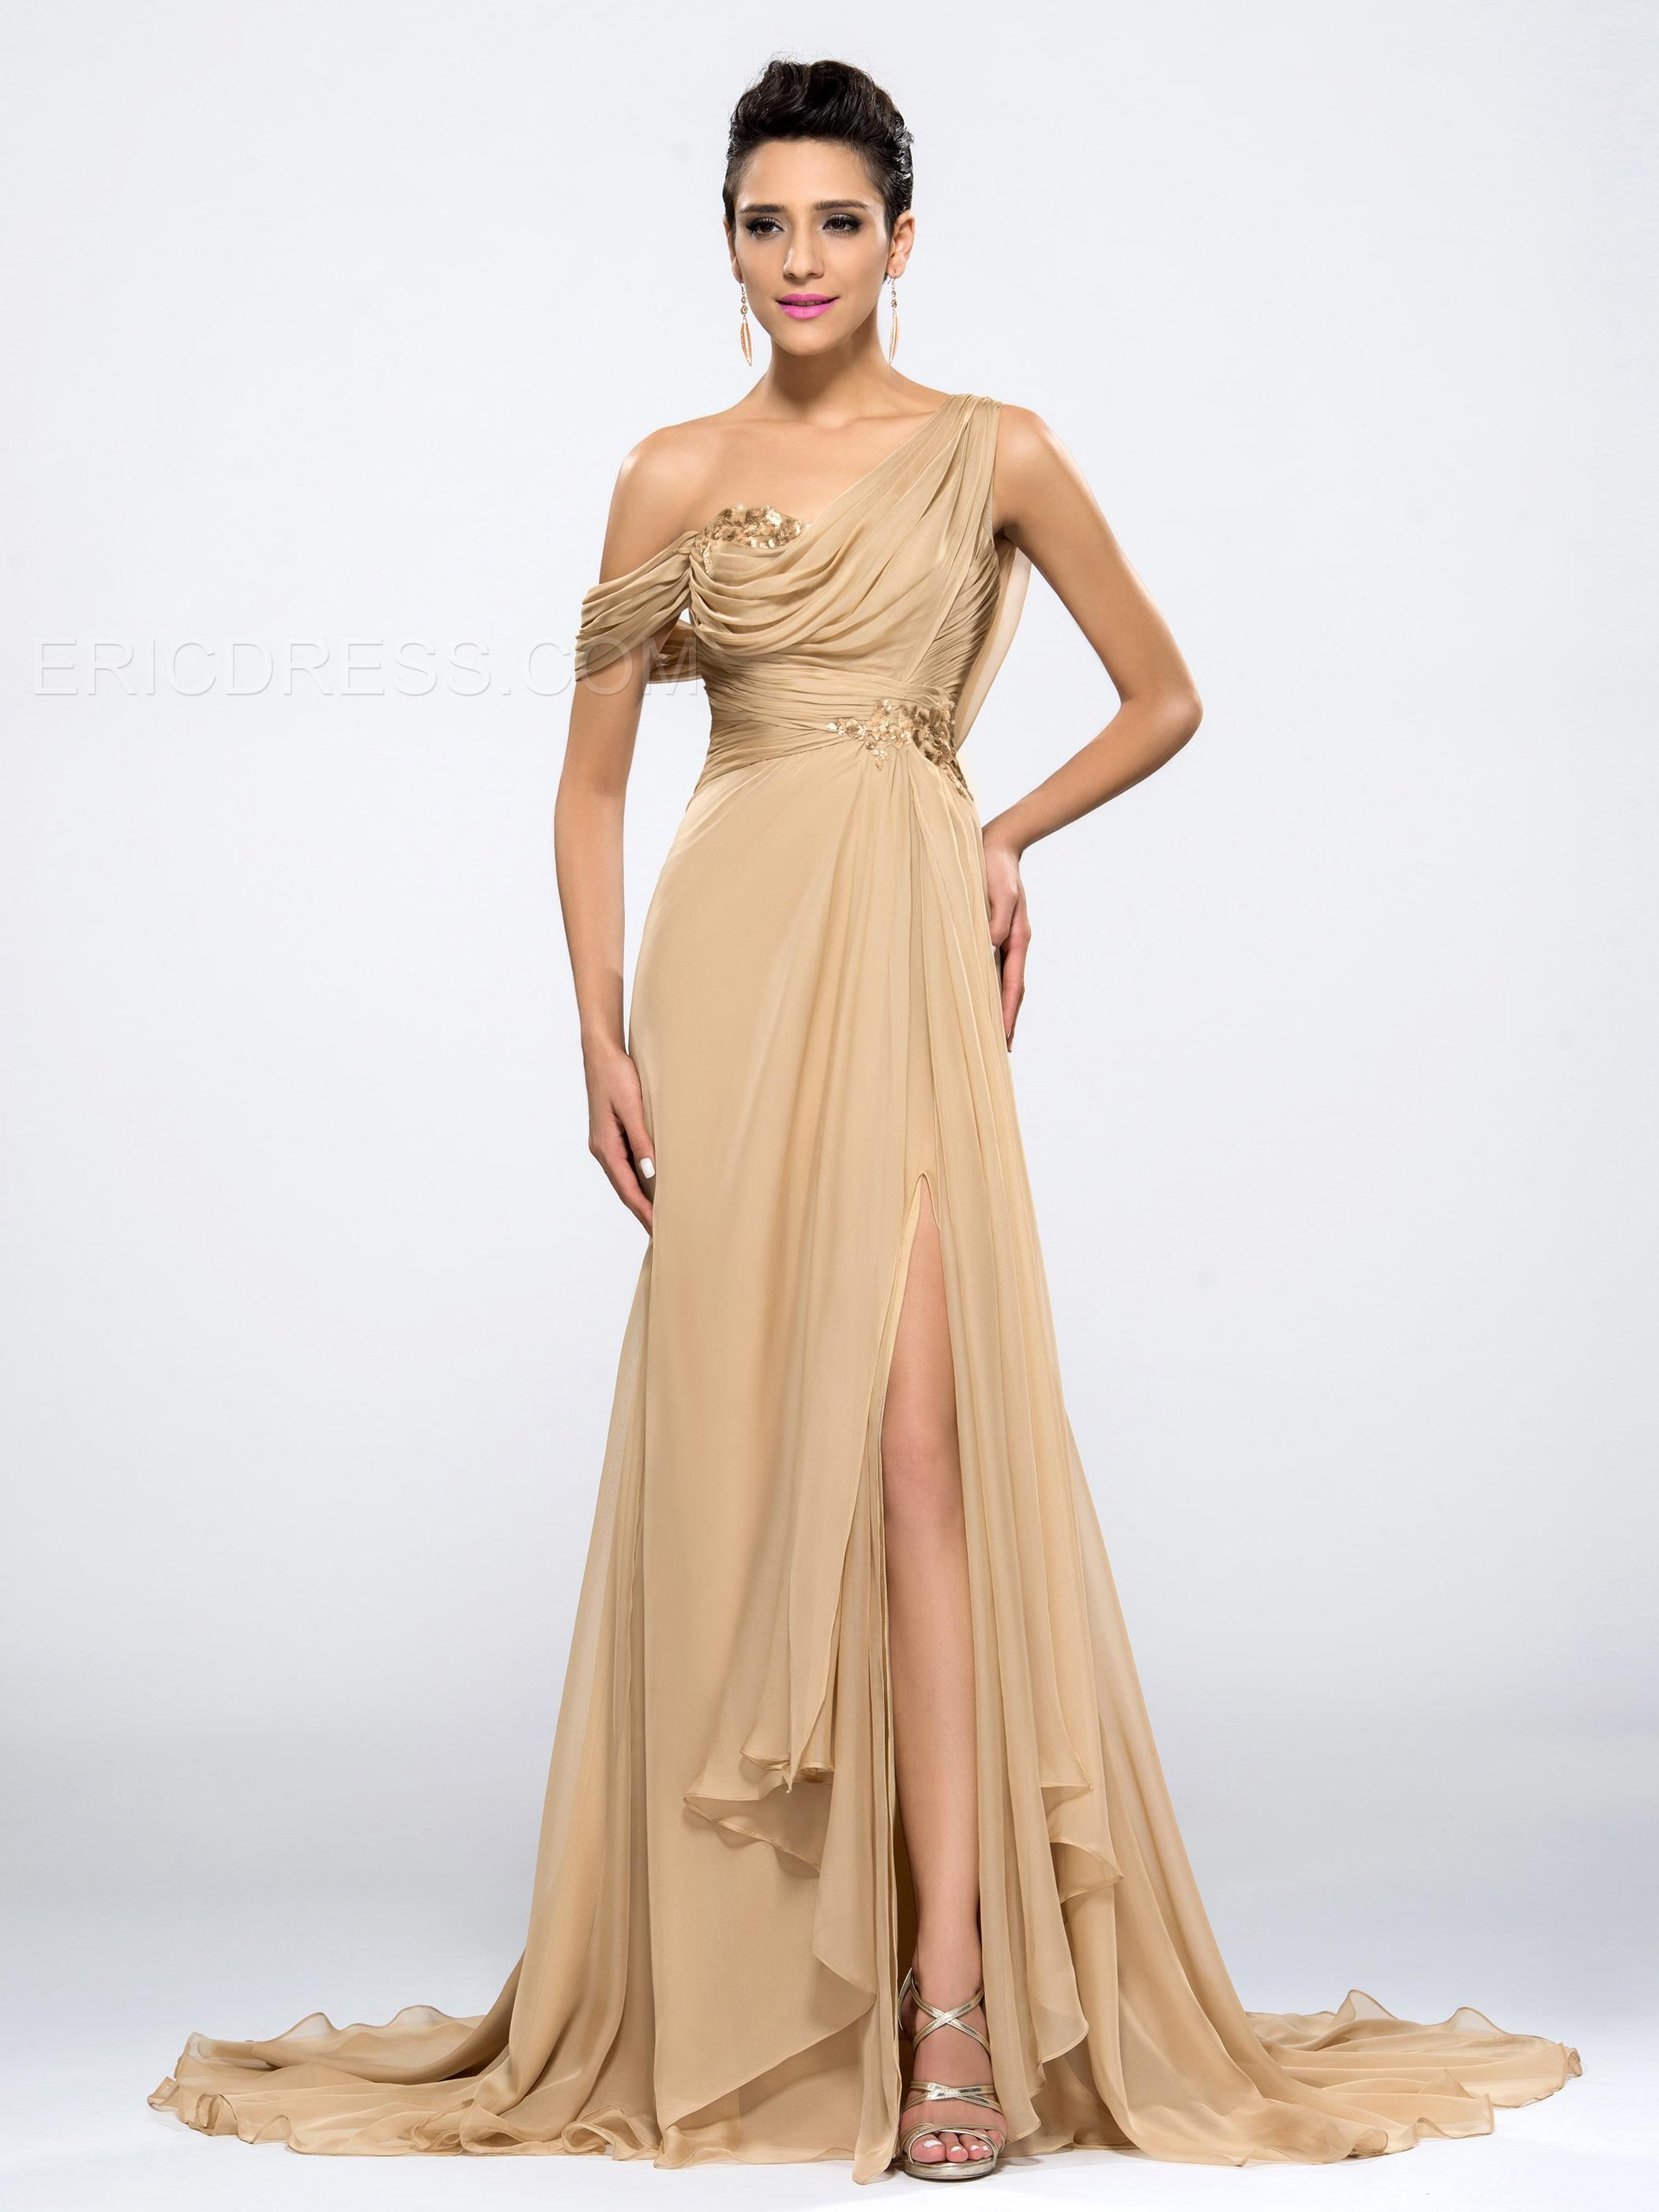 0d772cd4d Gorgeous Front-Split One-shoulder Floor-length Sequins Evening Dress  Popular Prom Dresses- ericdress.com 10990212